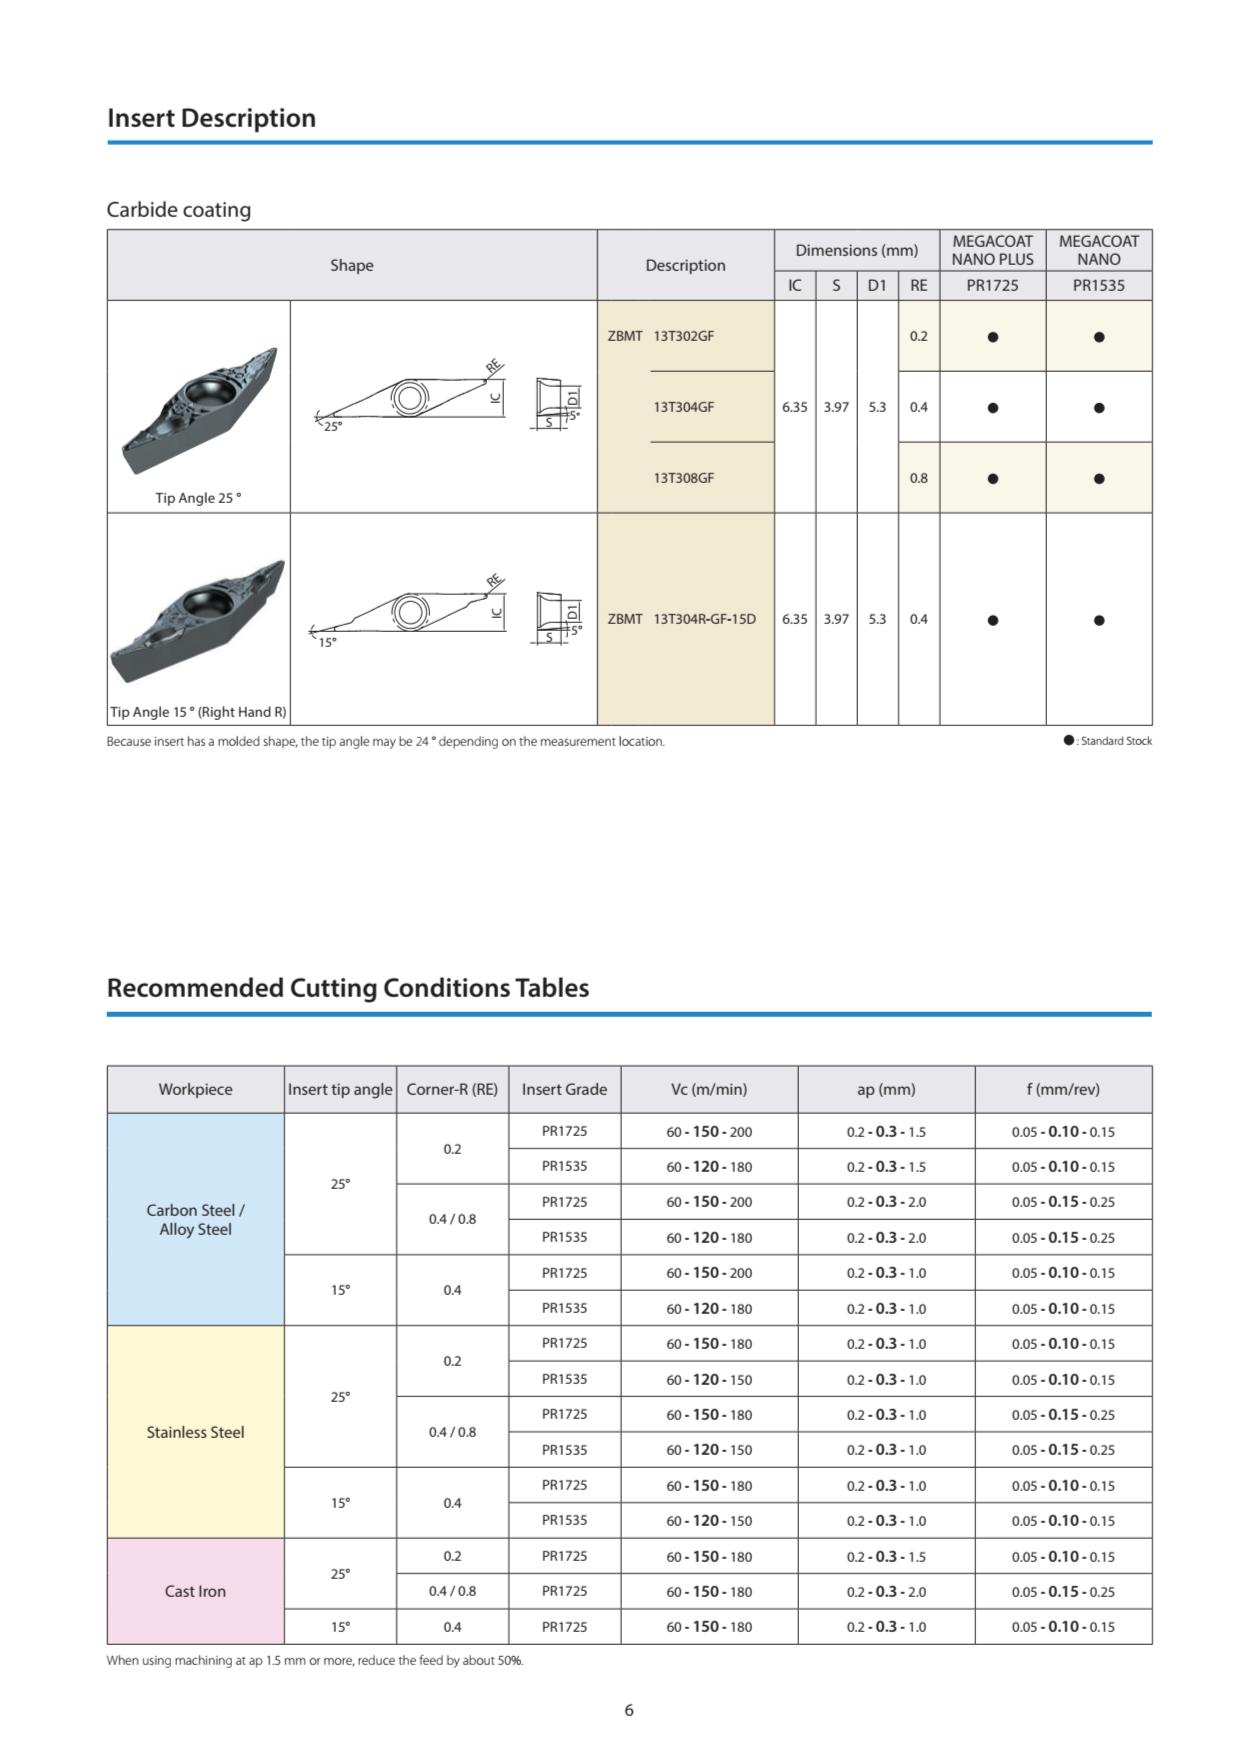 Mảnh Dao Tiện Profiling Kyocera ZBMT Series 3